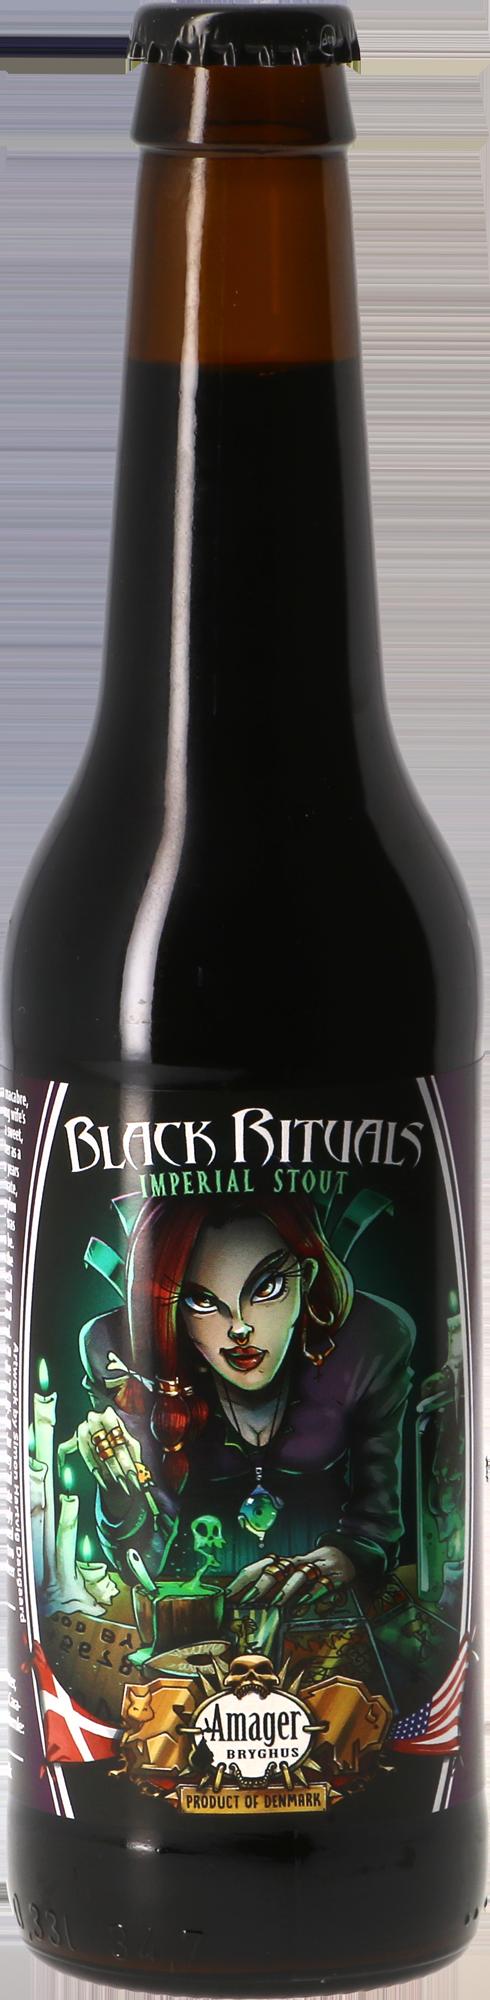 Amager Black Rituals